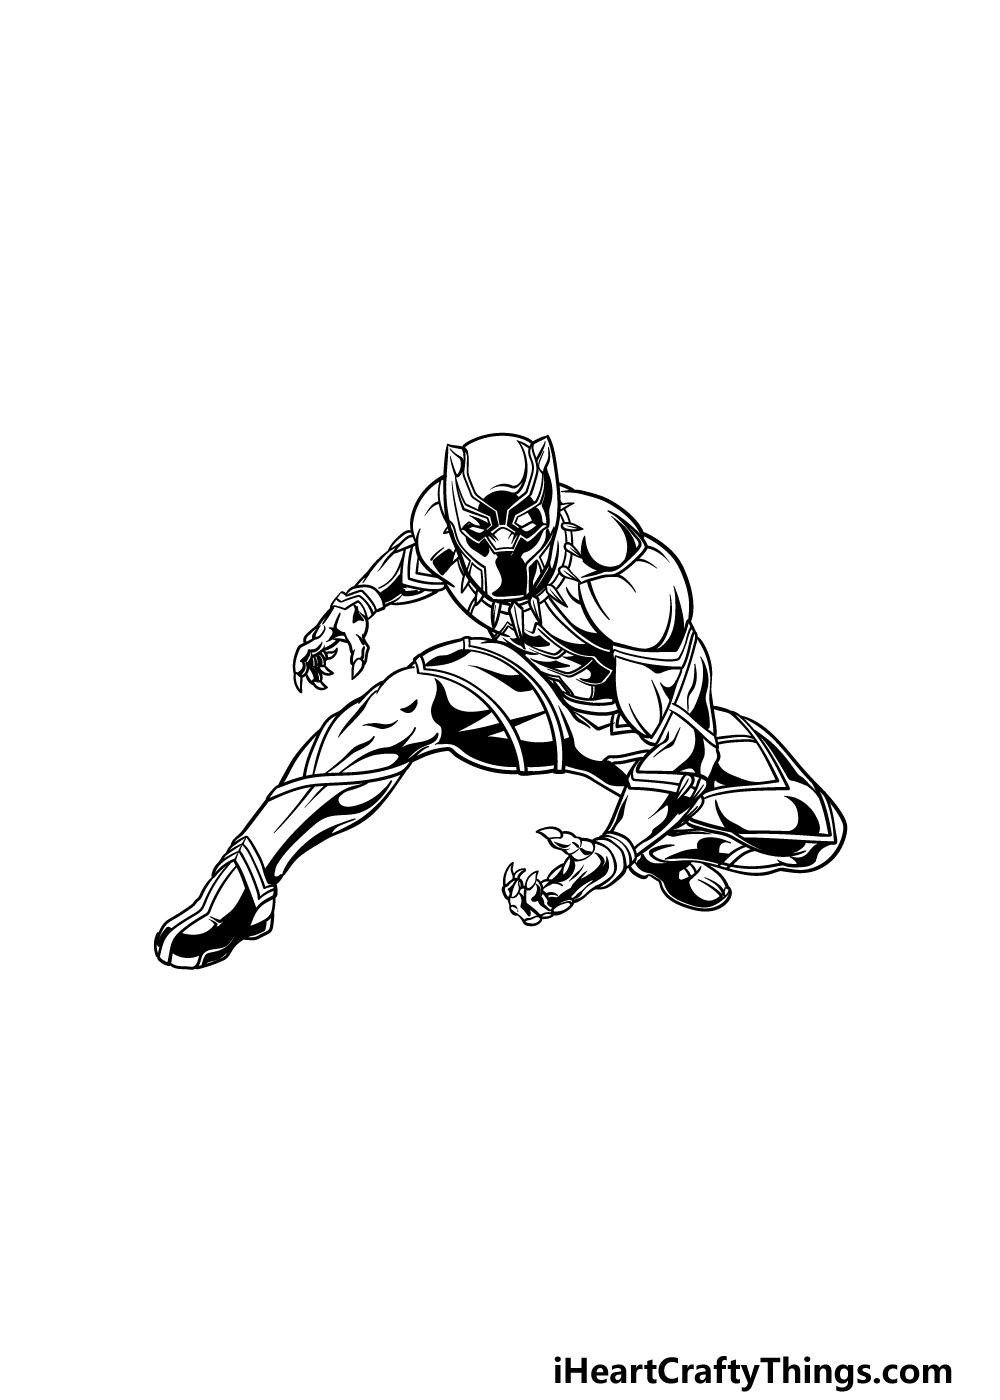 drawing Black Panther step 5